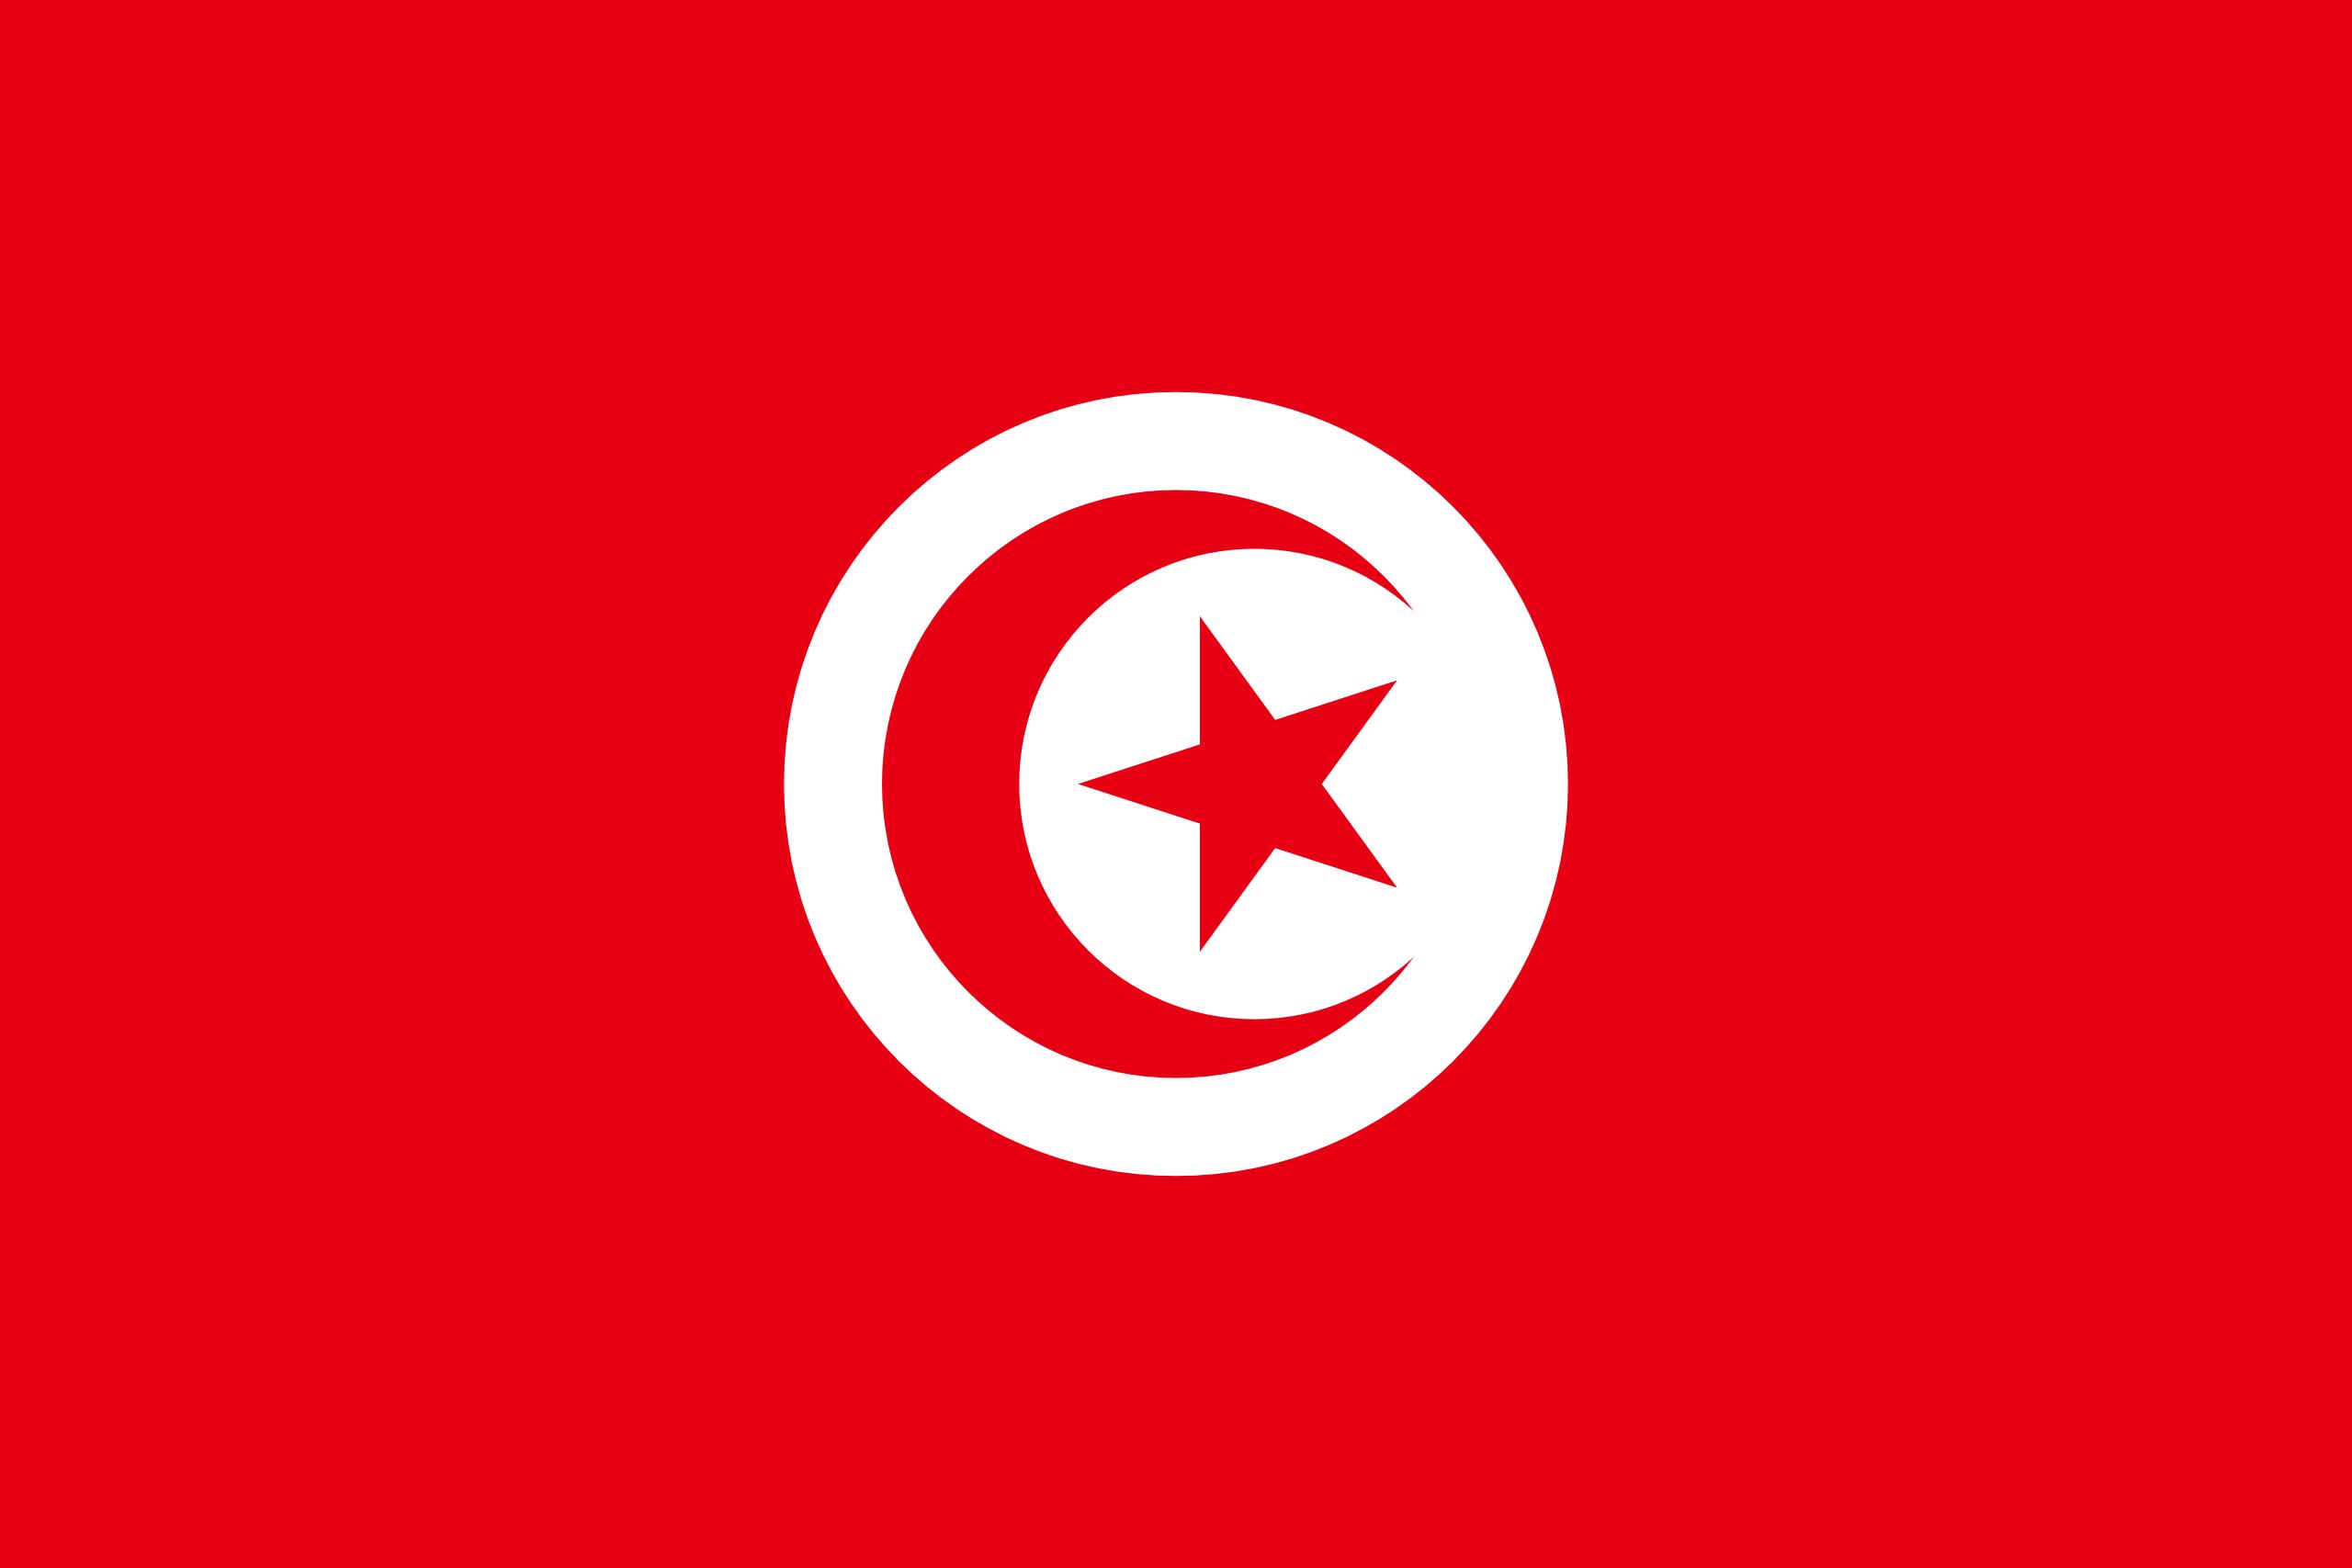 túnez, страна, Эмблема, логотип, символ - Обои HD - Профессор falken.com